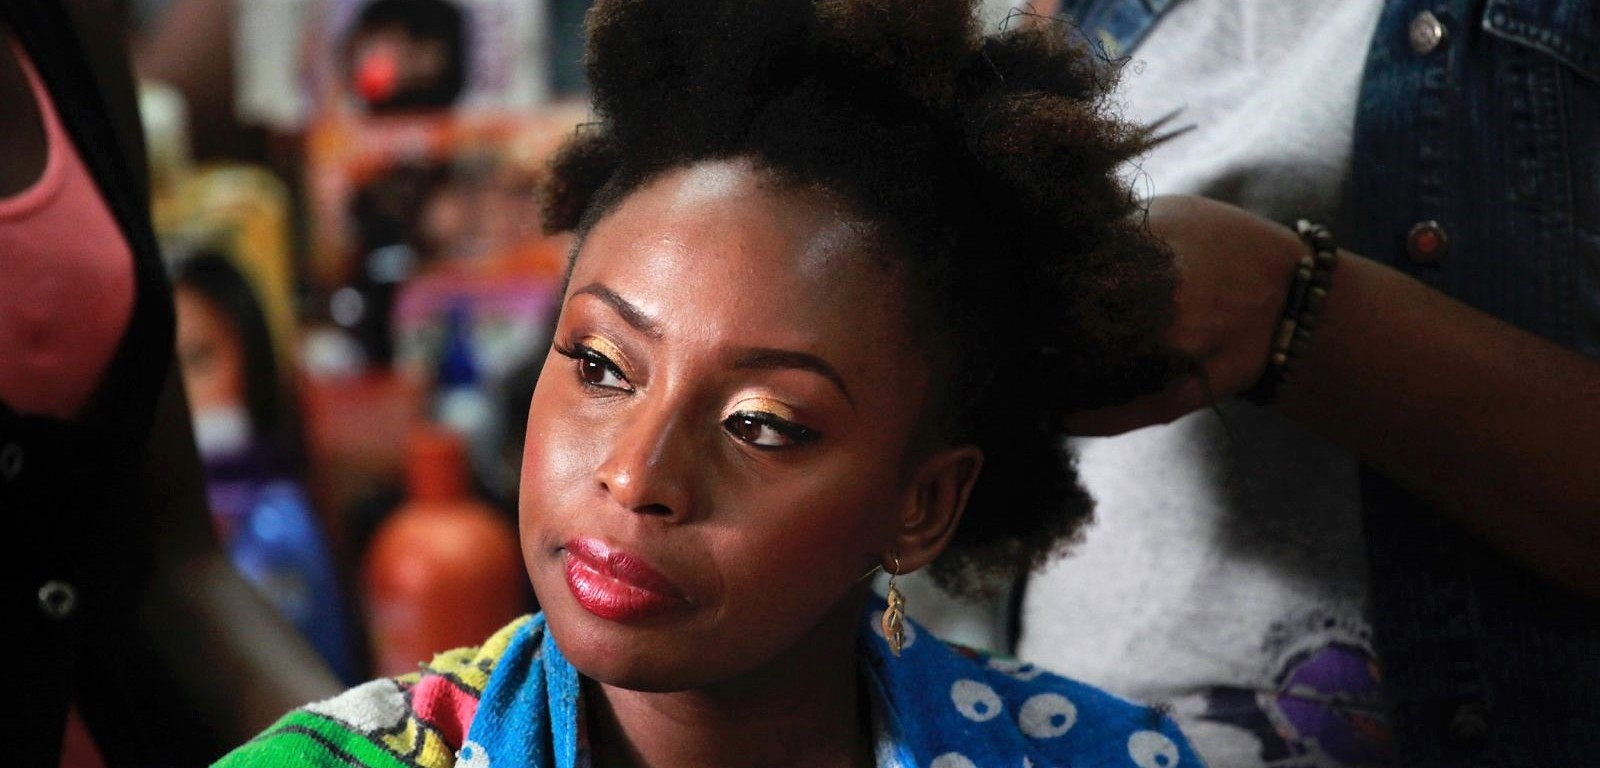 Chimamanda Ngozi Adichie par Akintunde Akinleye - Scarlet La culture des idées